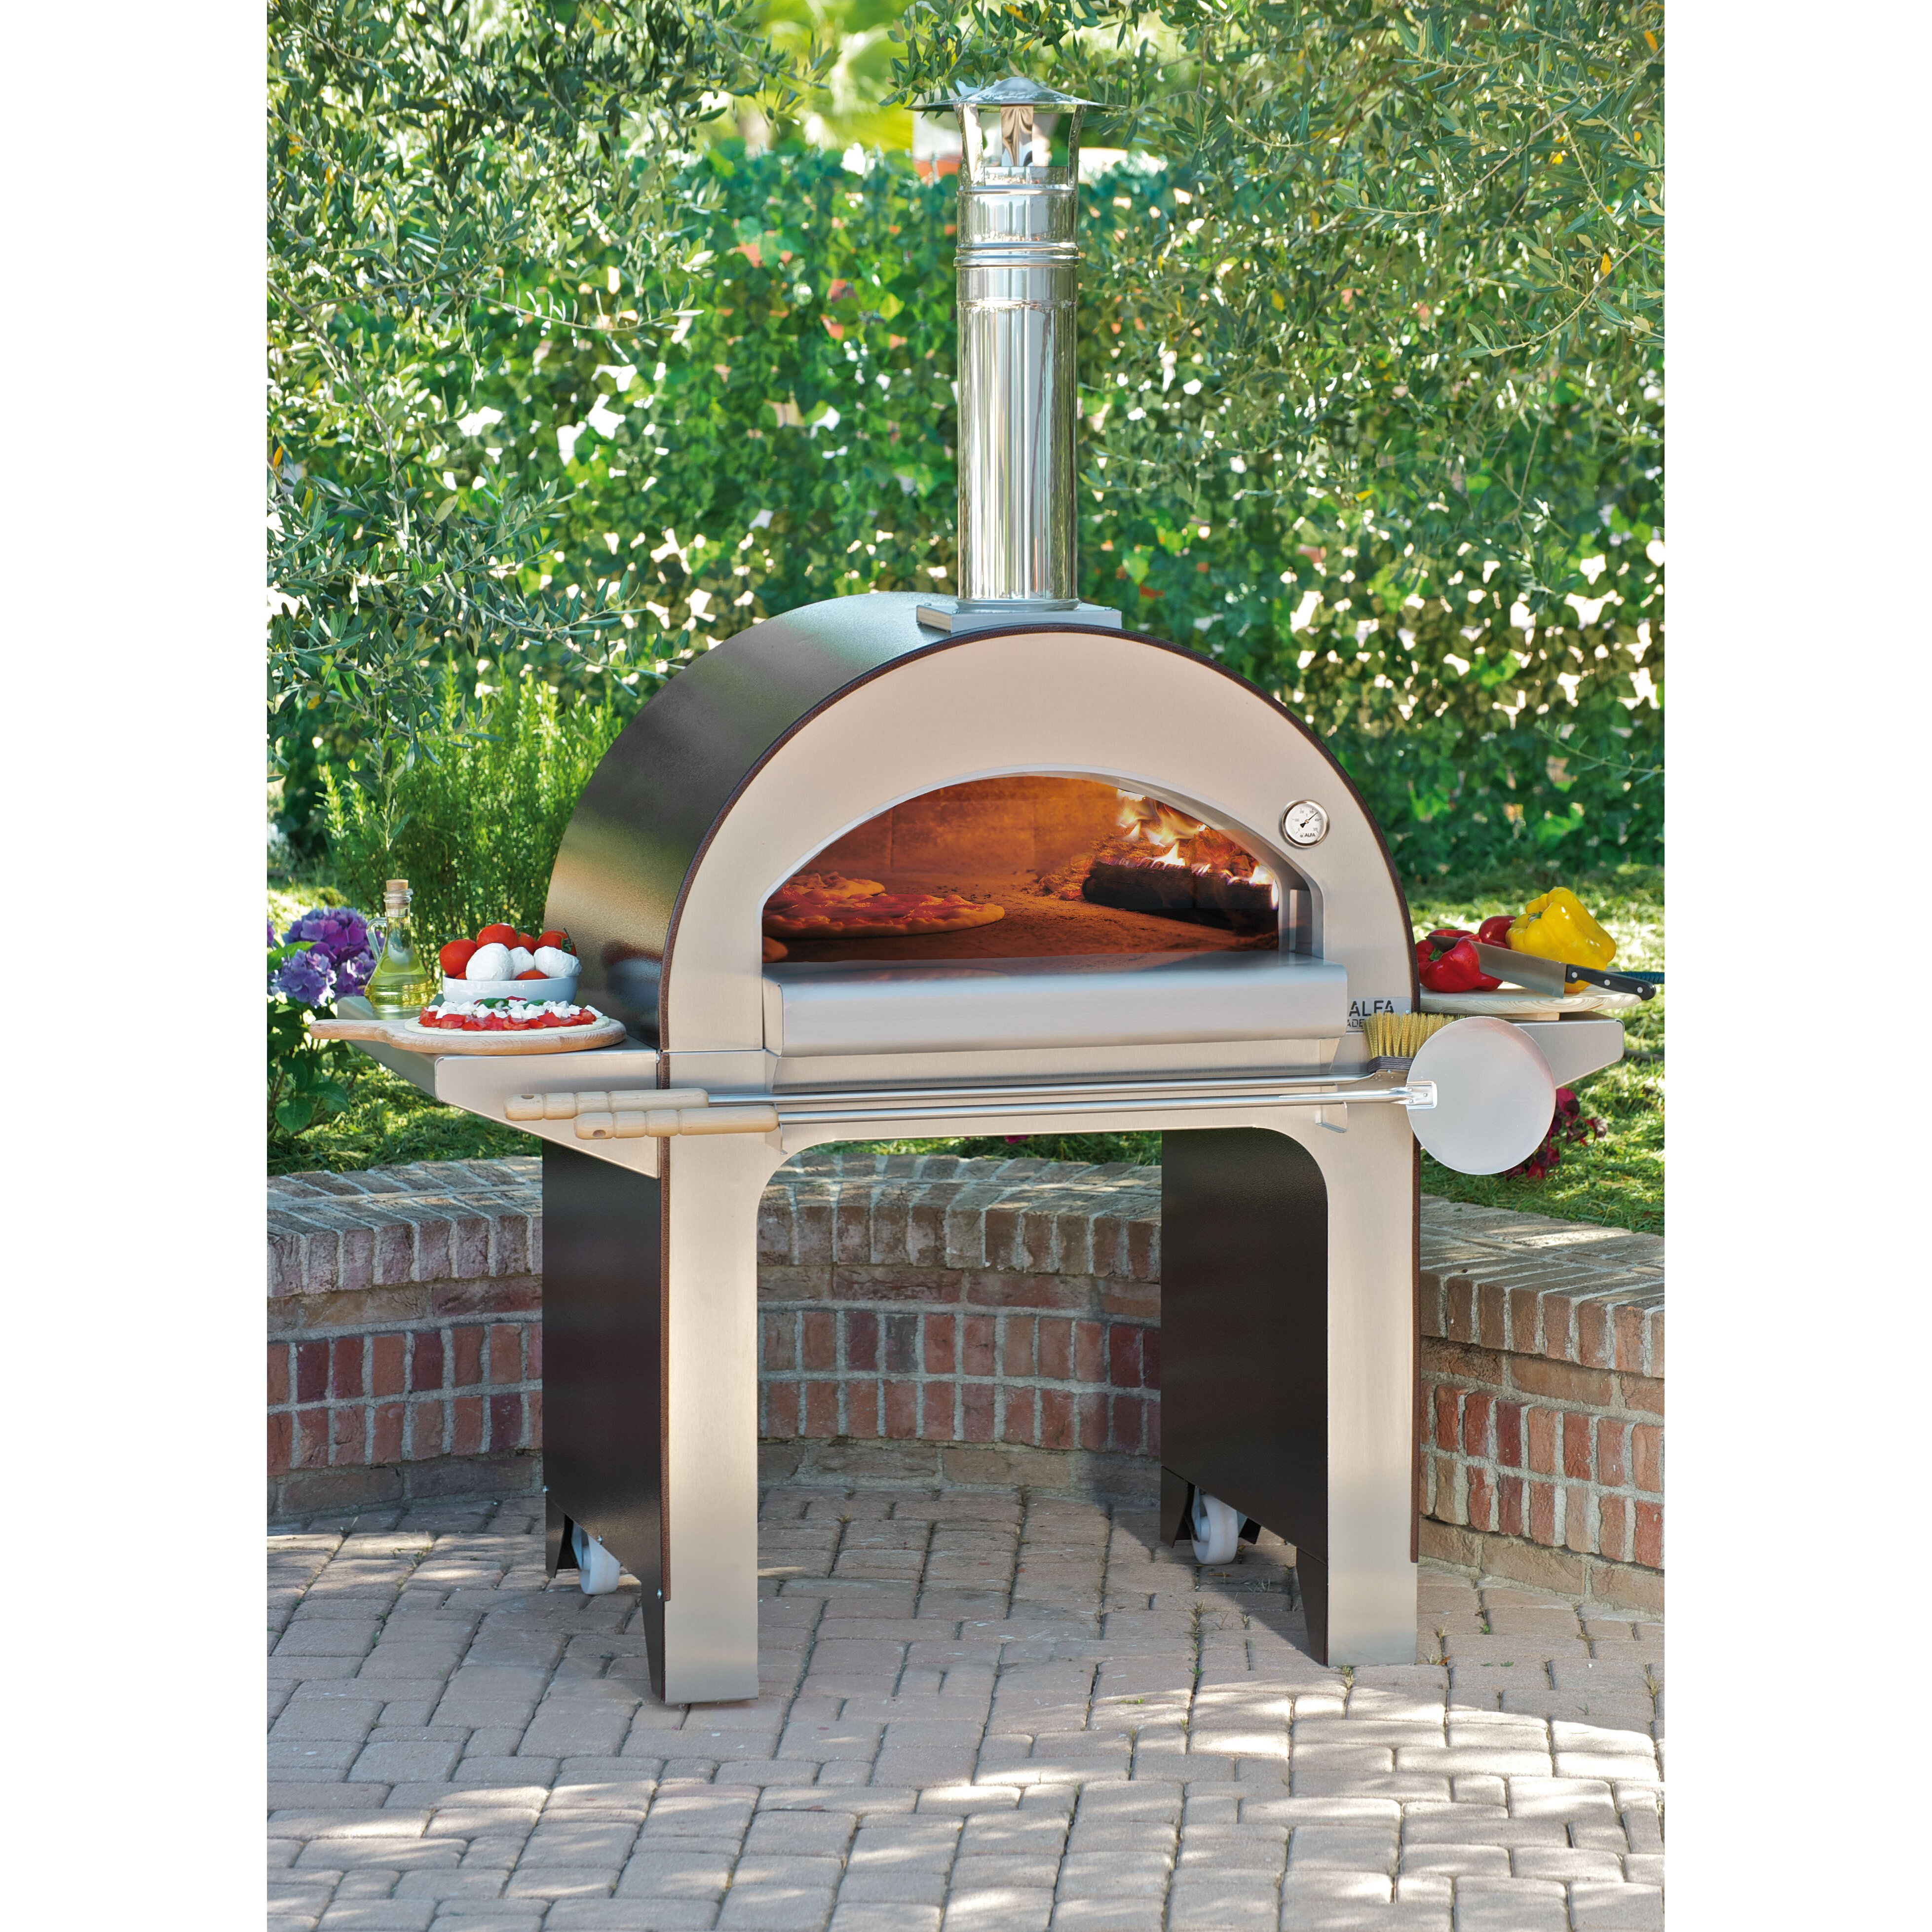 Kitchen Pizza Oven Wood